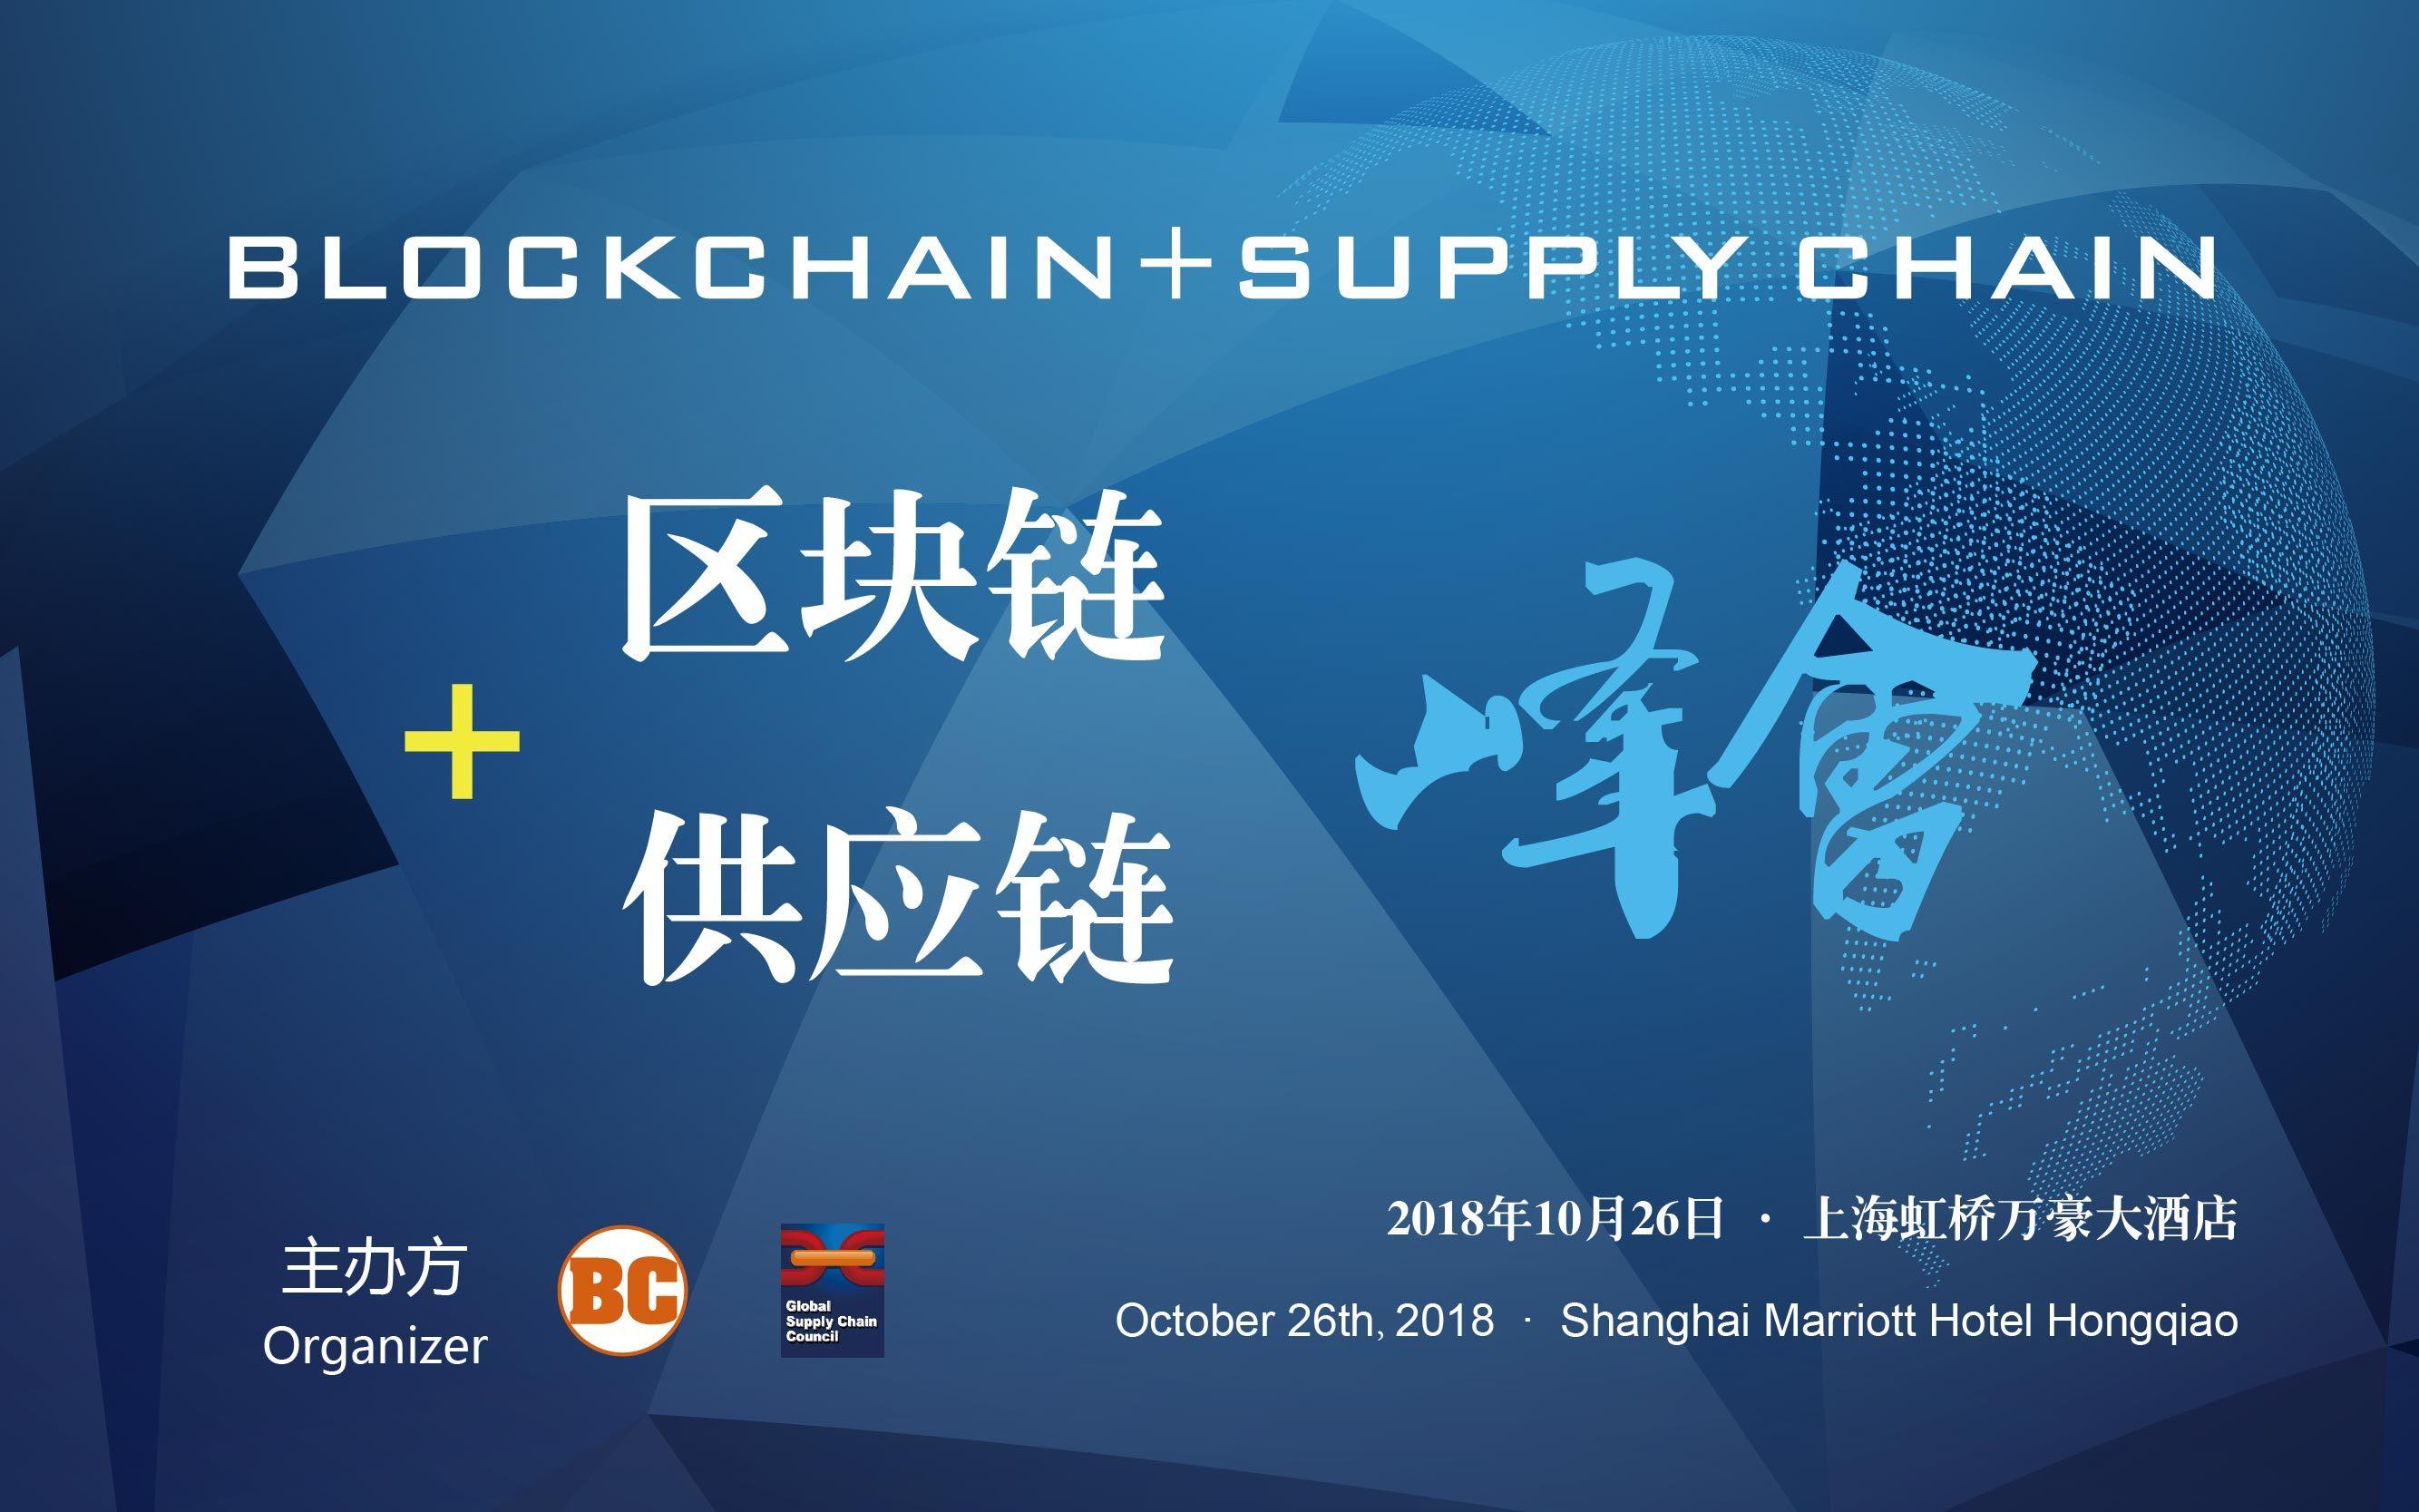 2018区块链+供应链金融创新峰会 China Blockchain + Supply Chain Summit